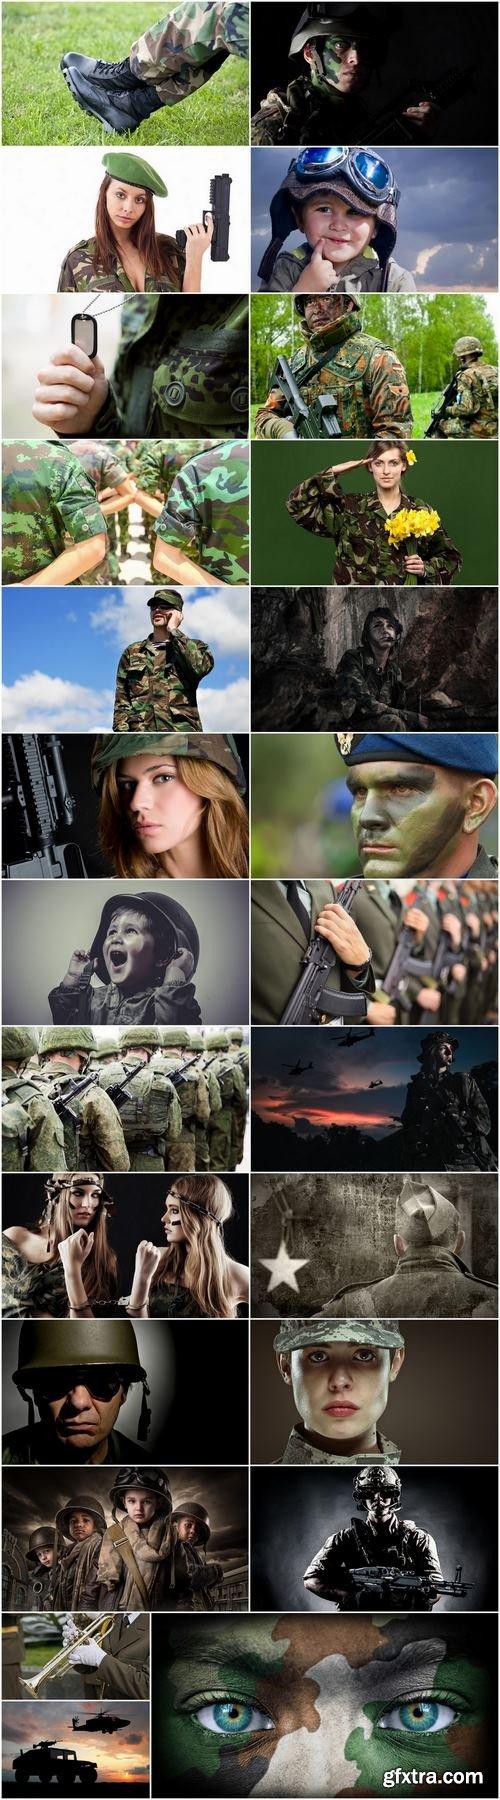 People in military uniform 25 HQ Jpeg